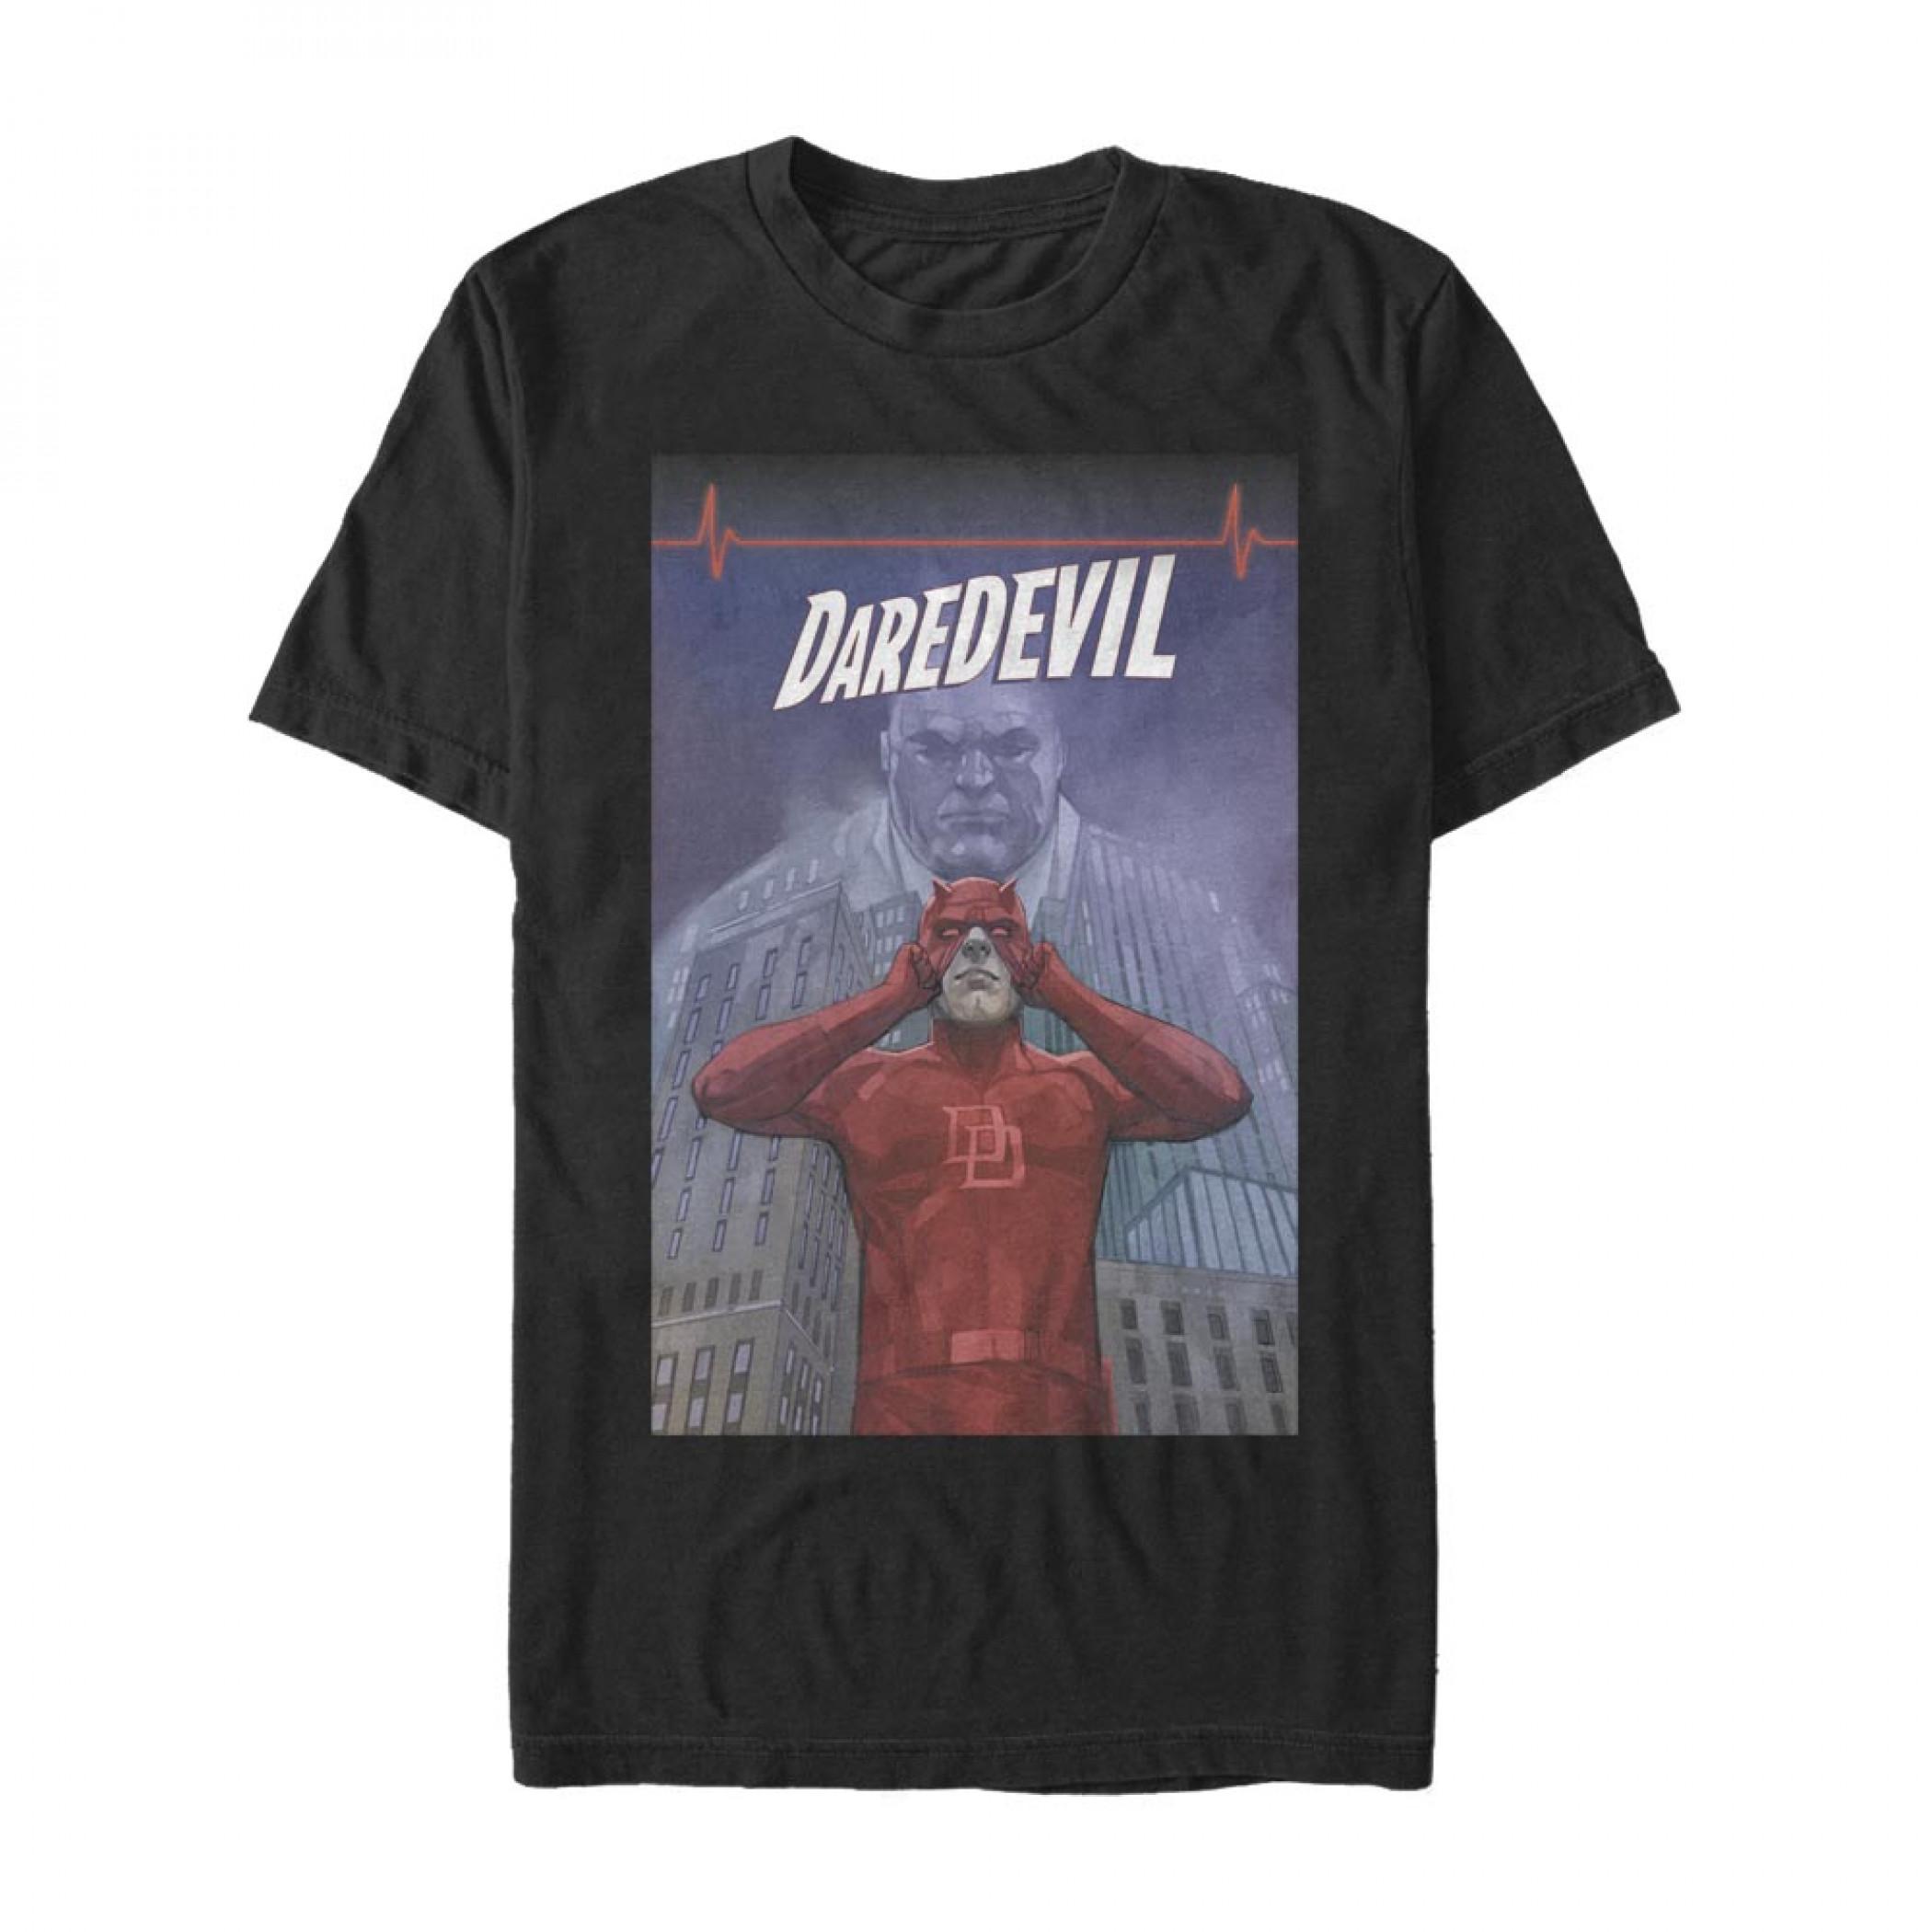 Daredevil Comic Cover T-Shirt